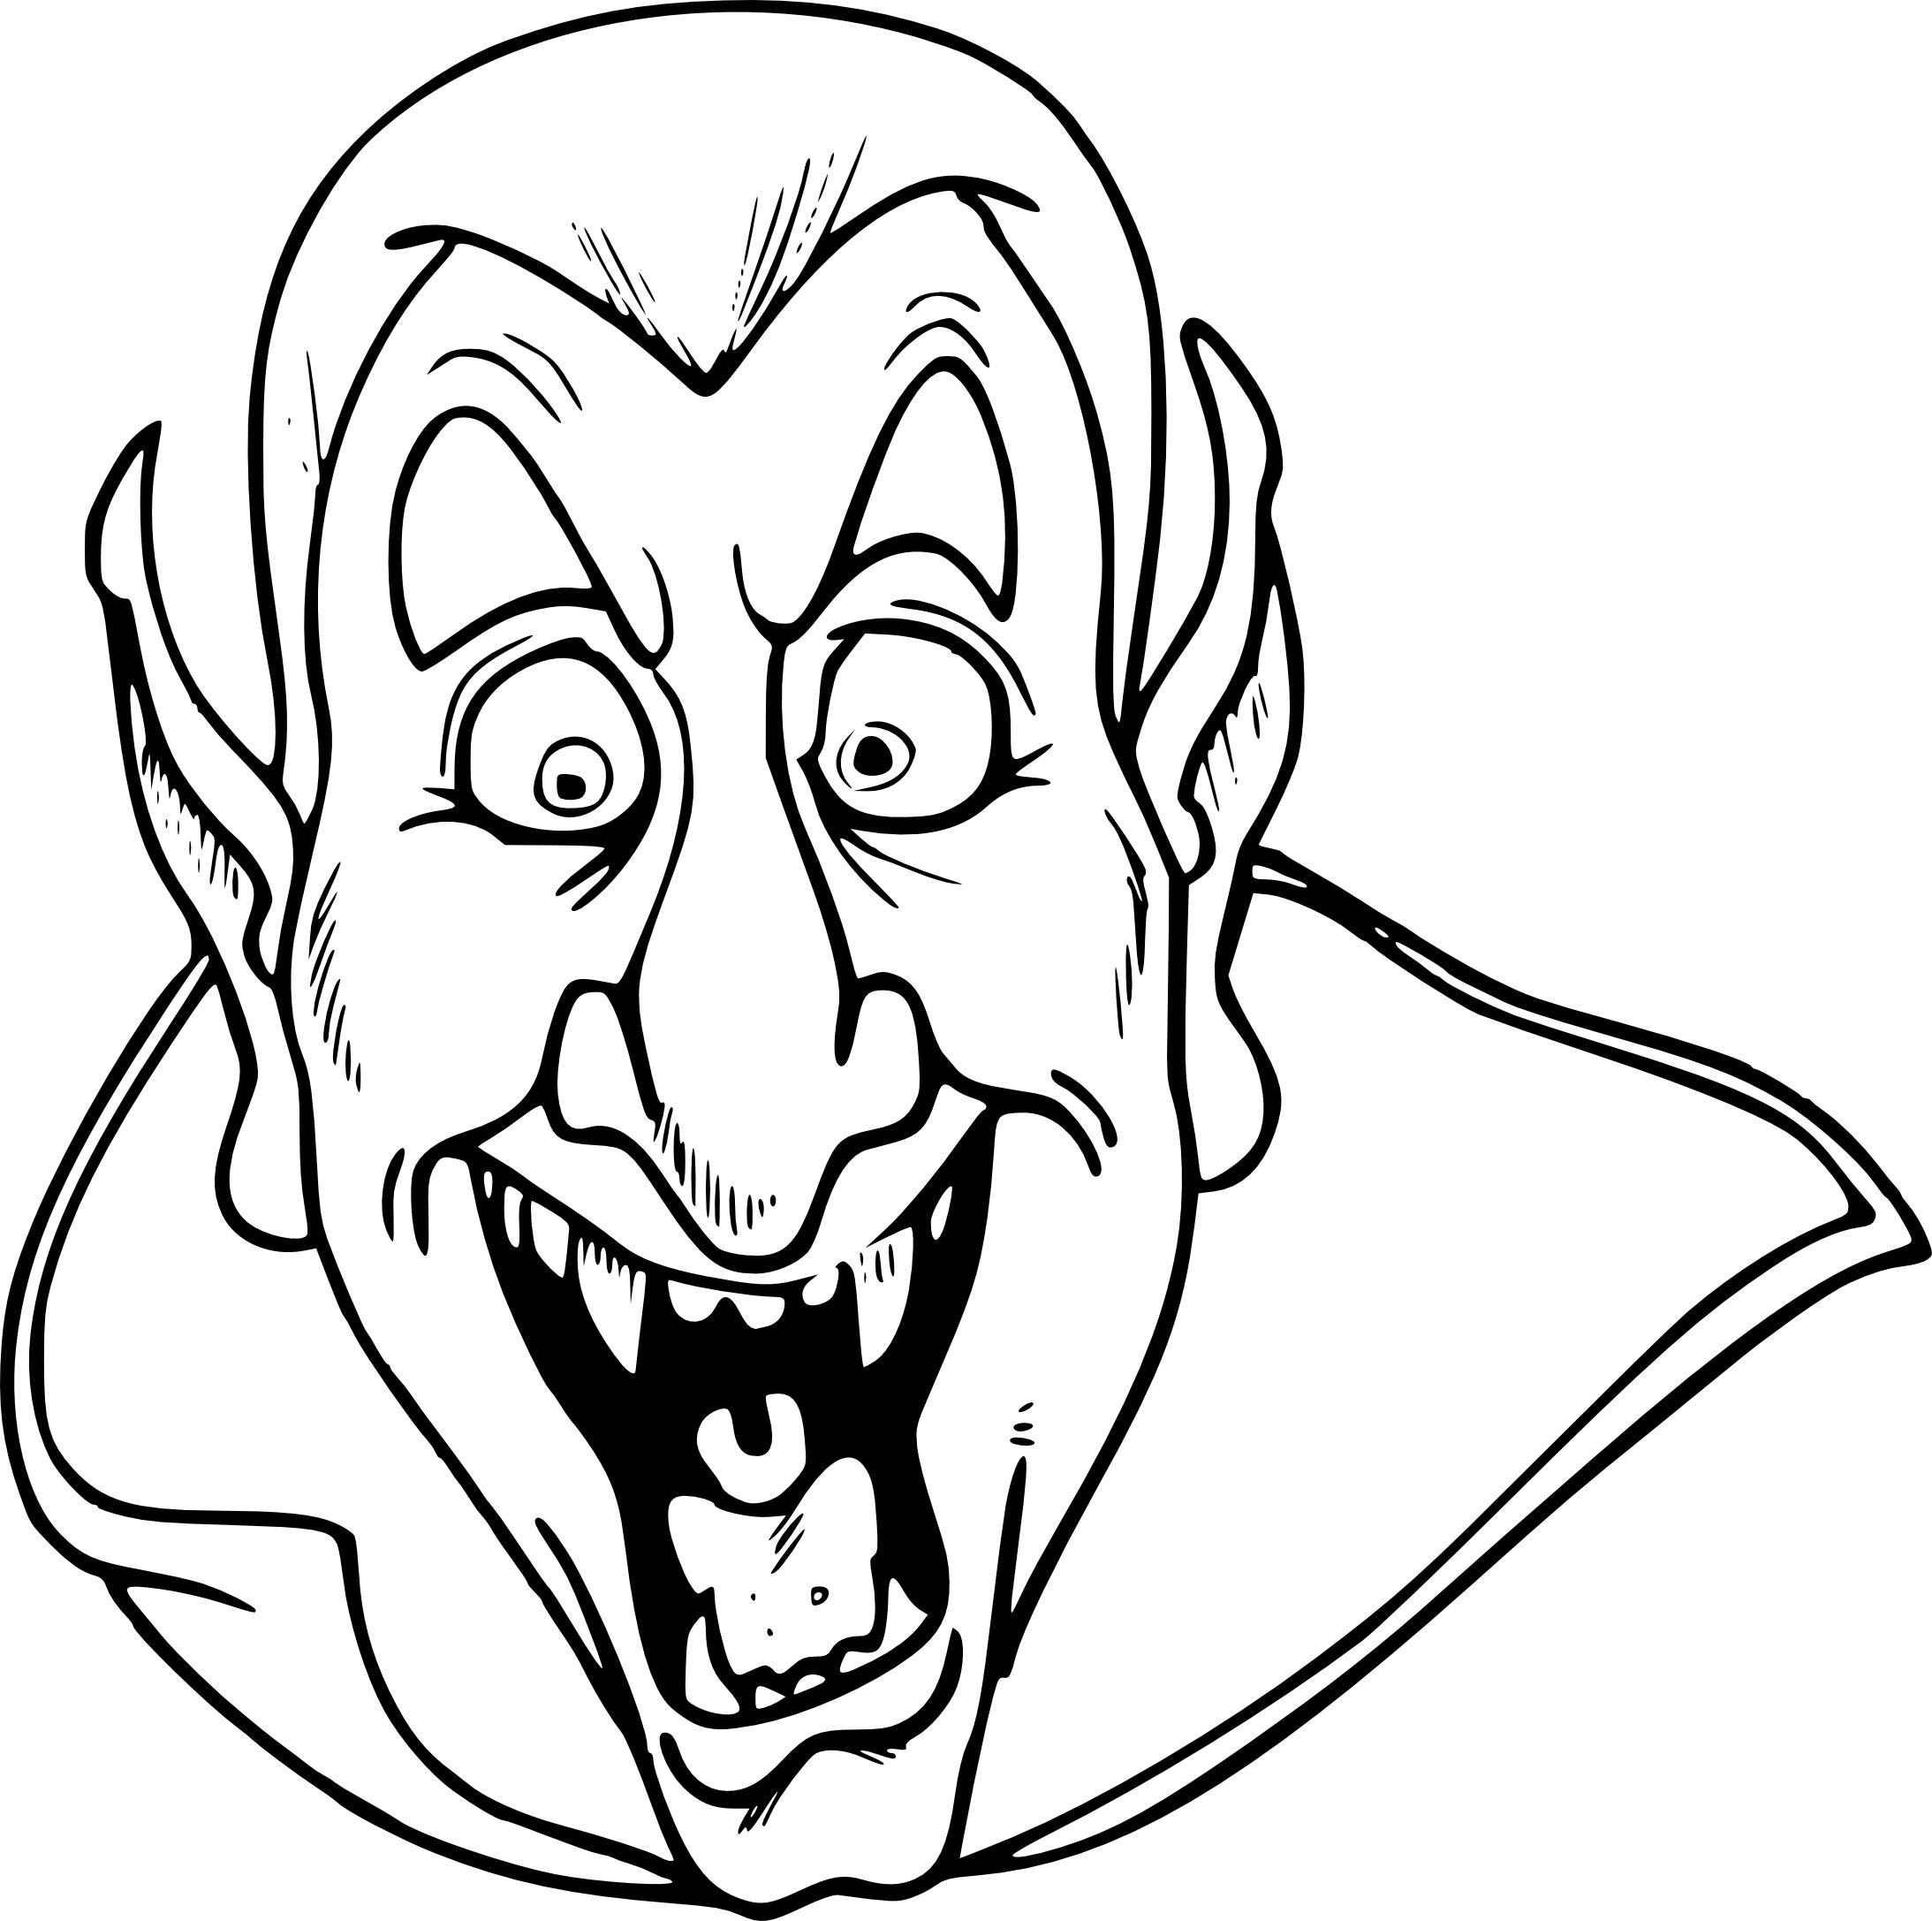 Coloriage t te de vampire imprimer - Coloriage de vampire a imprimer ...